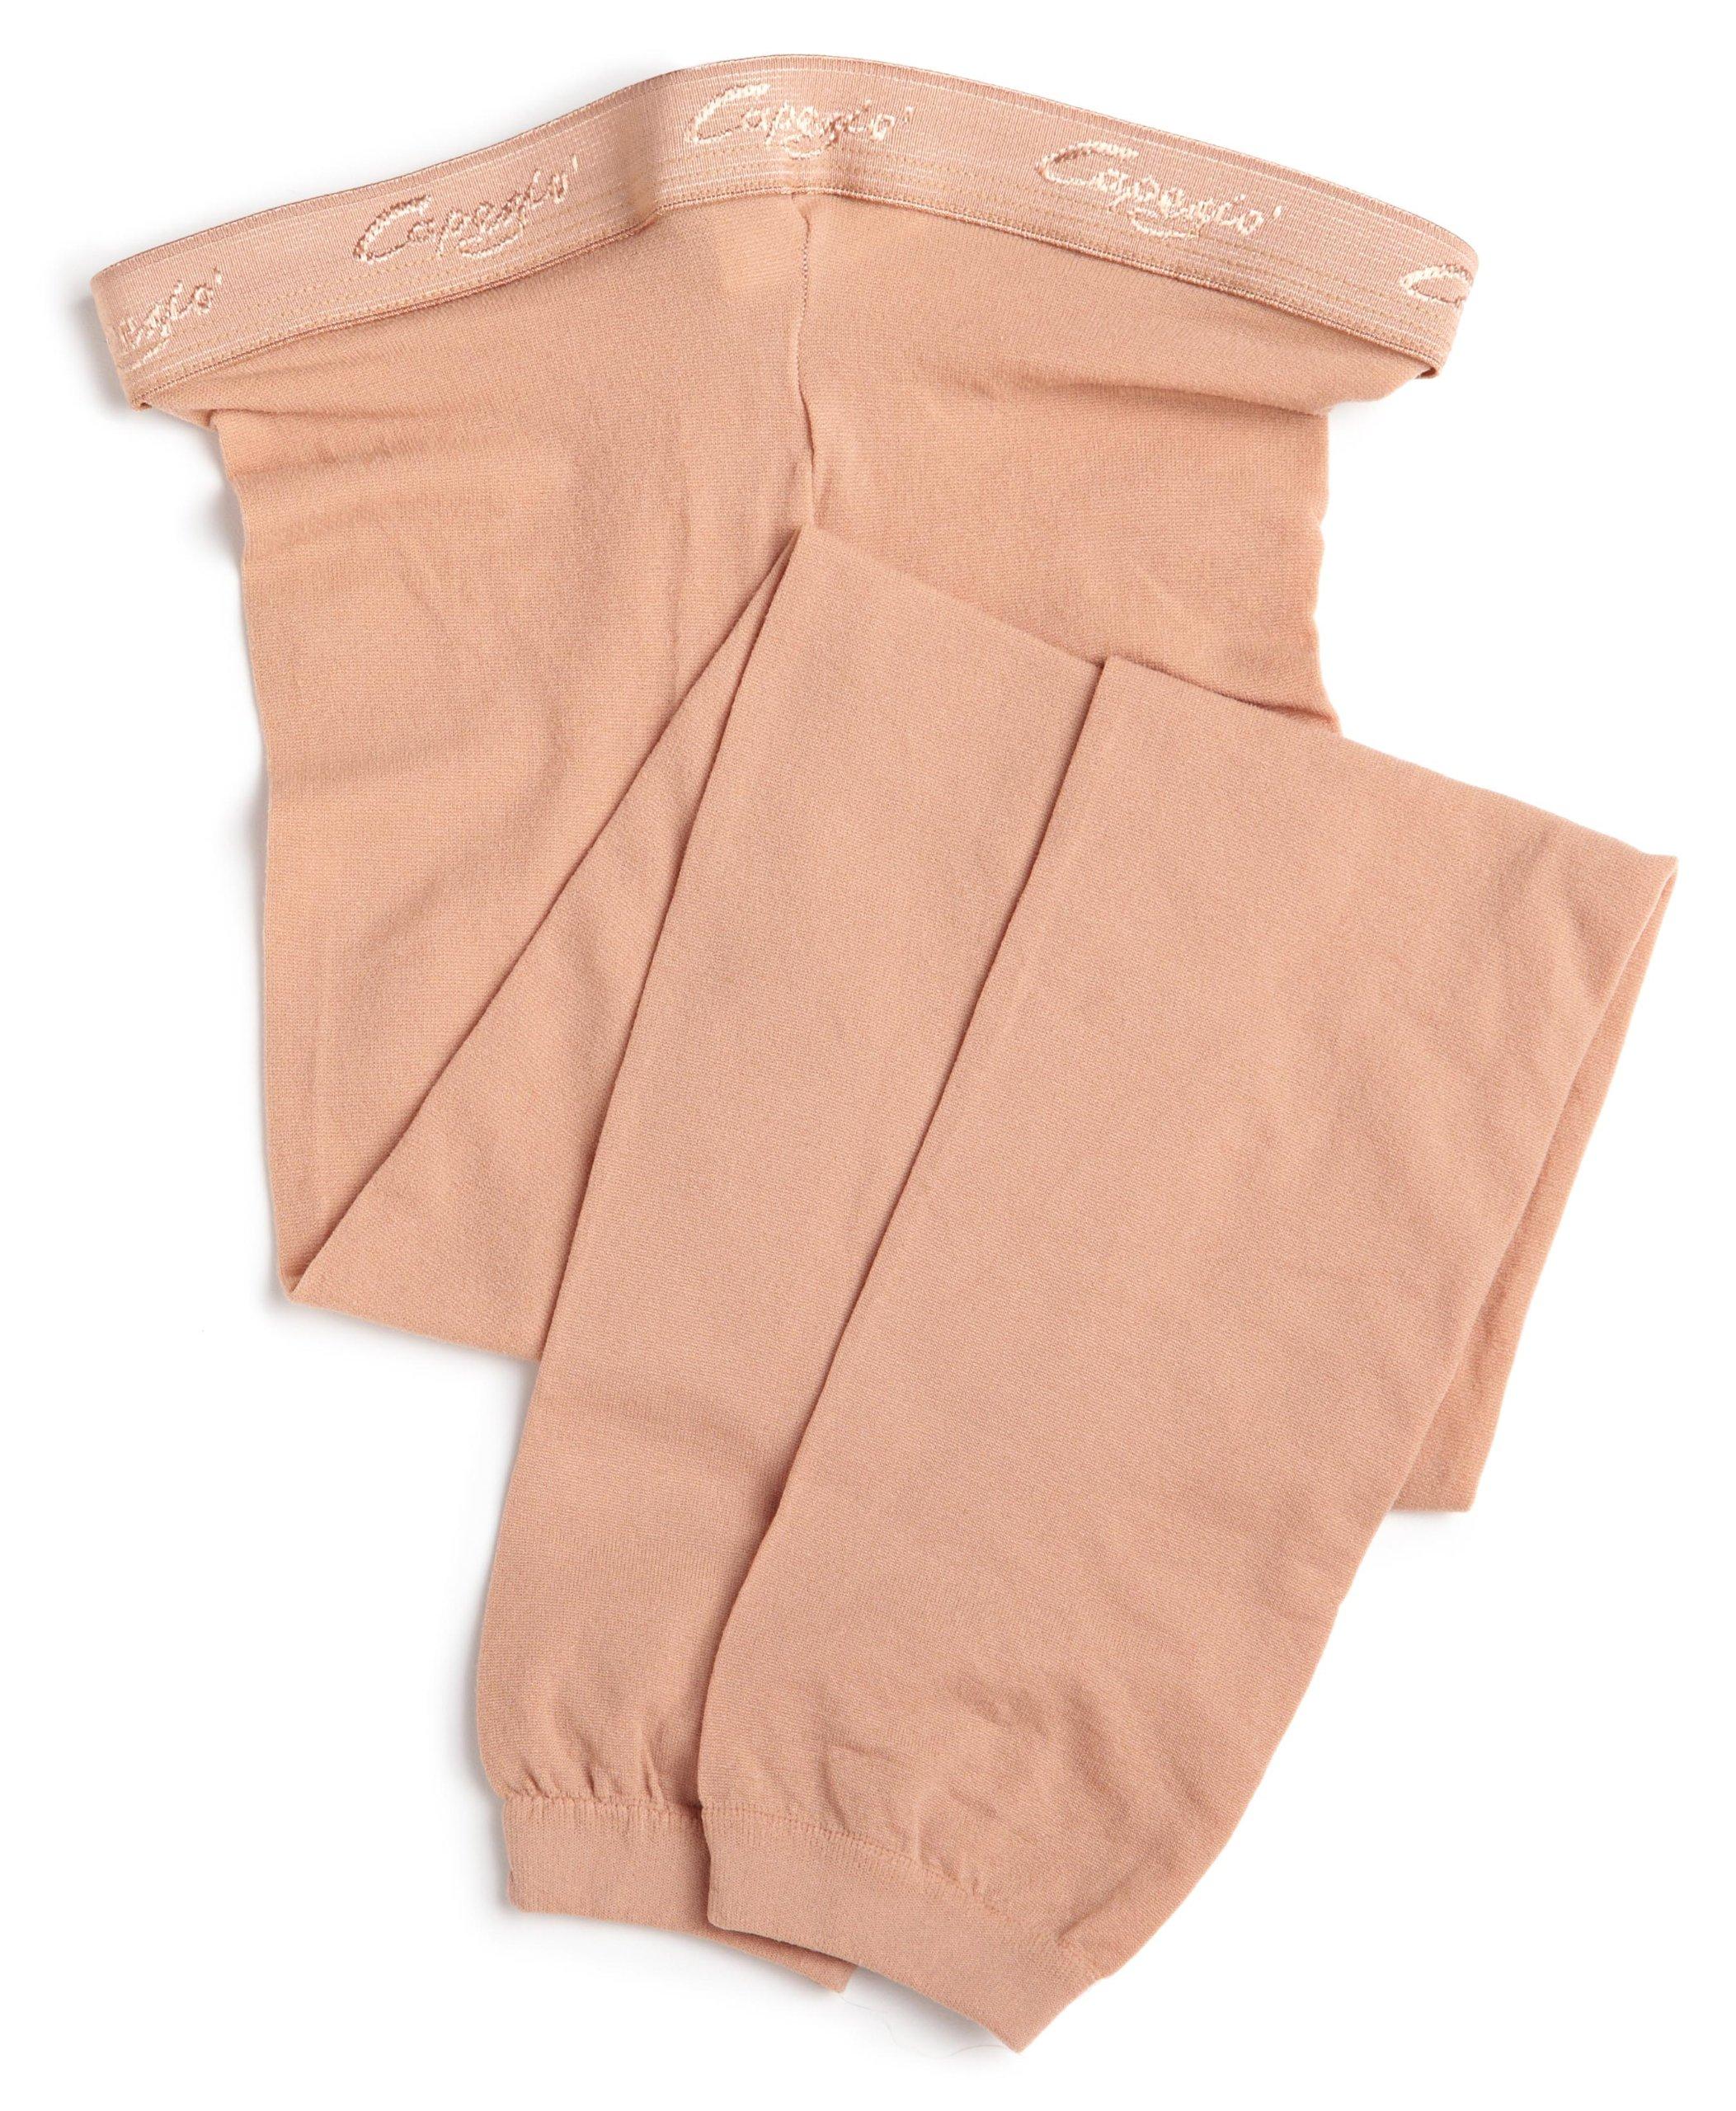 Capezio Big Girls' Hold & Stretch Footless Tight Socks, Light Suntan, Medium